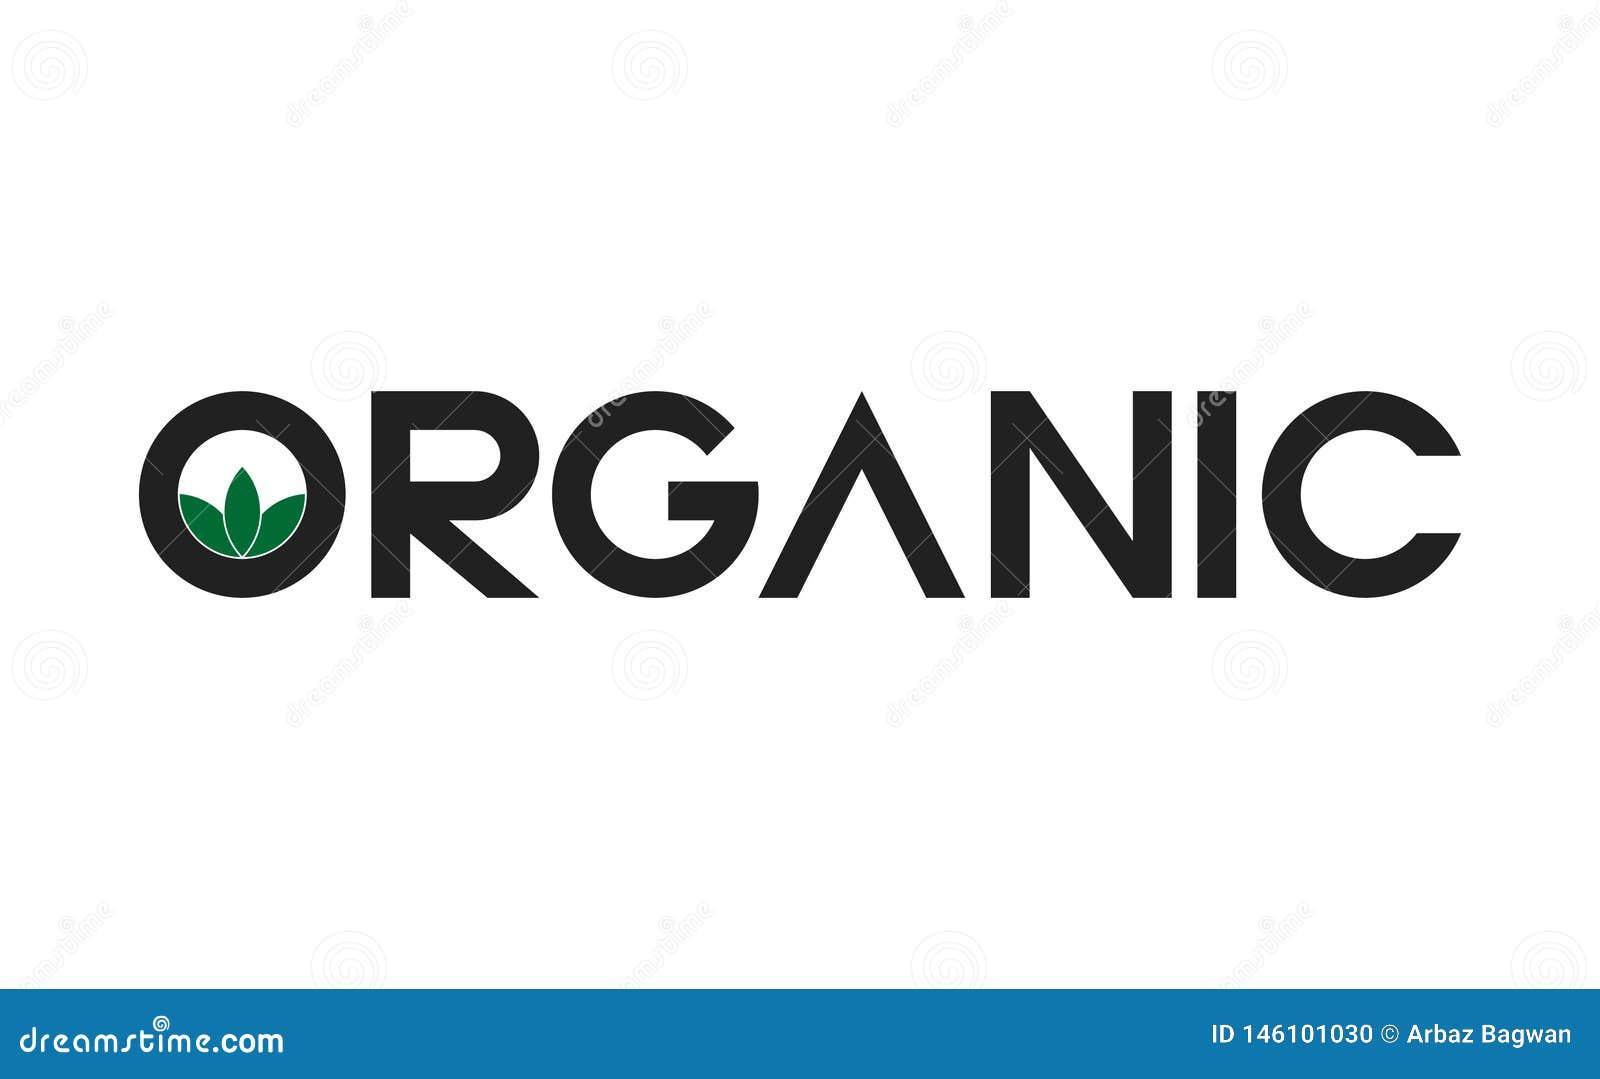 Organic leaves text logo